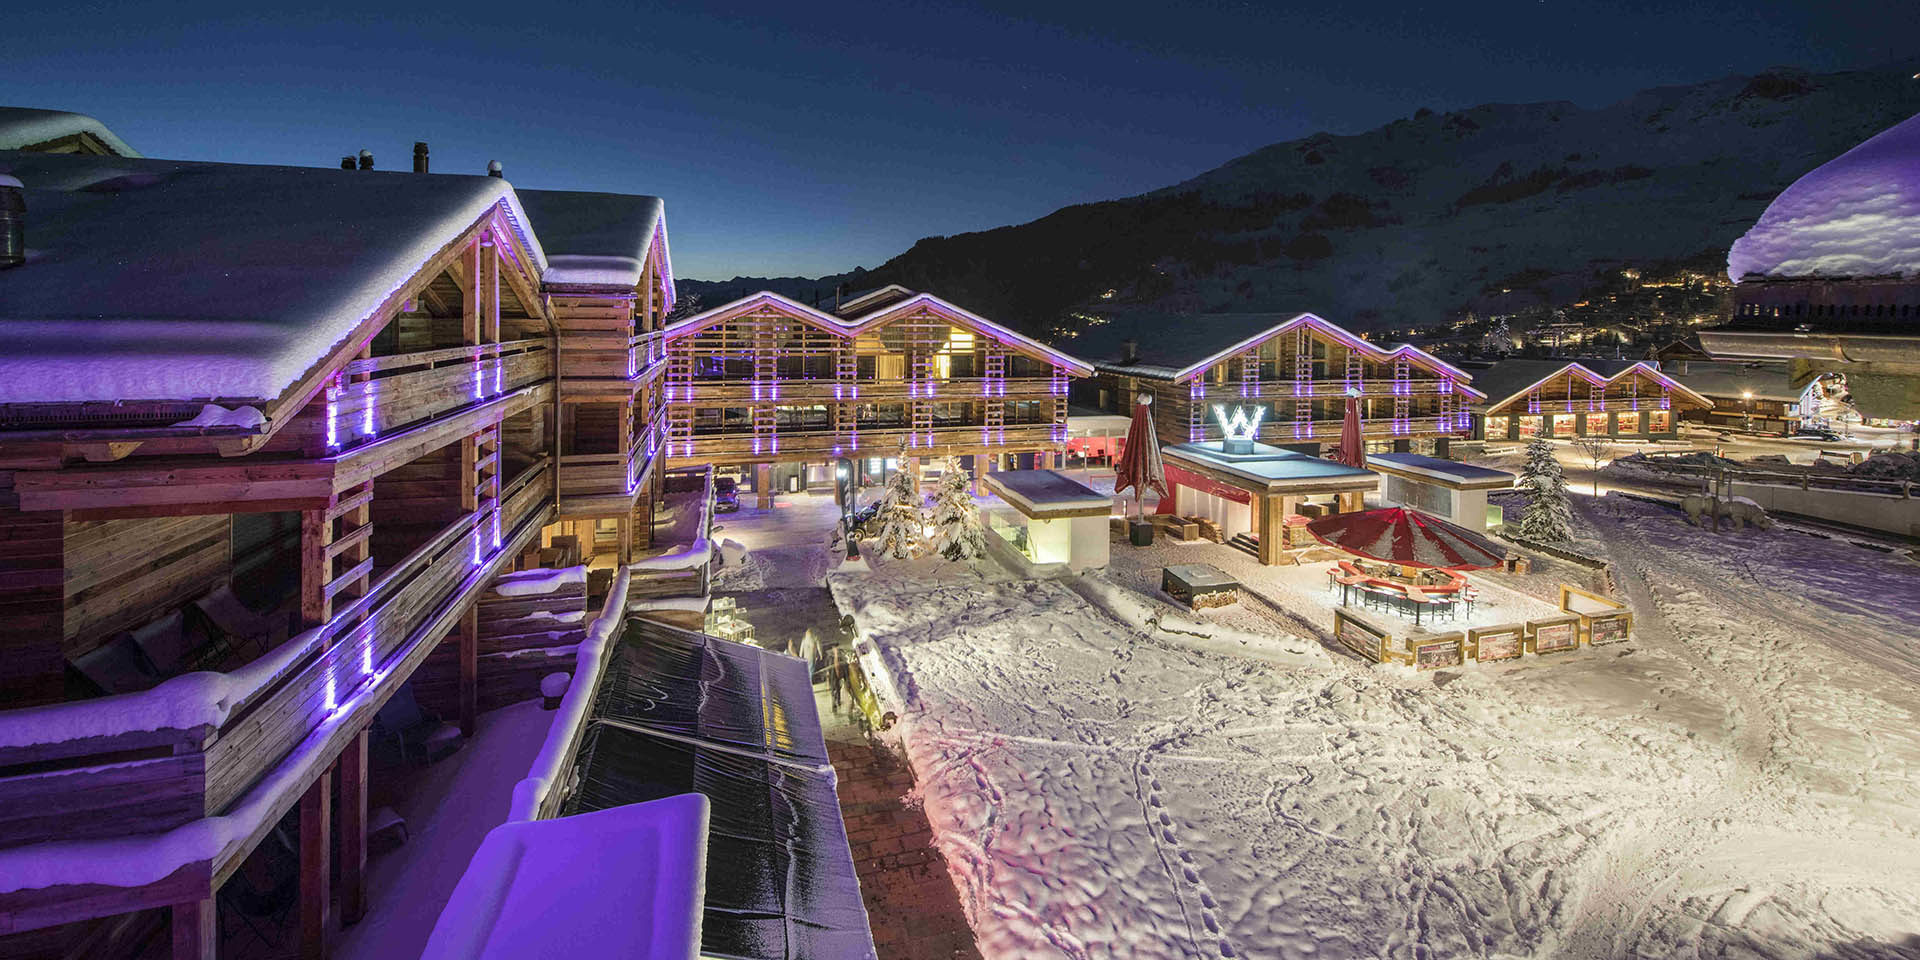 Appartement Place Blanche 2 Verbier Les 4 Vallees Zwitserland wintersport skivakantie luxe uitzicht dorpsplein sneeuw bergen verlichting